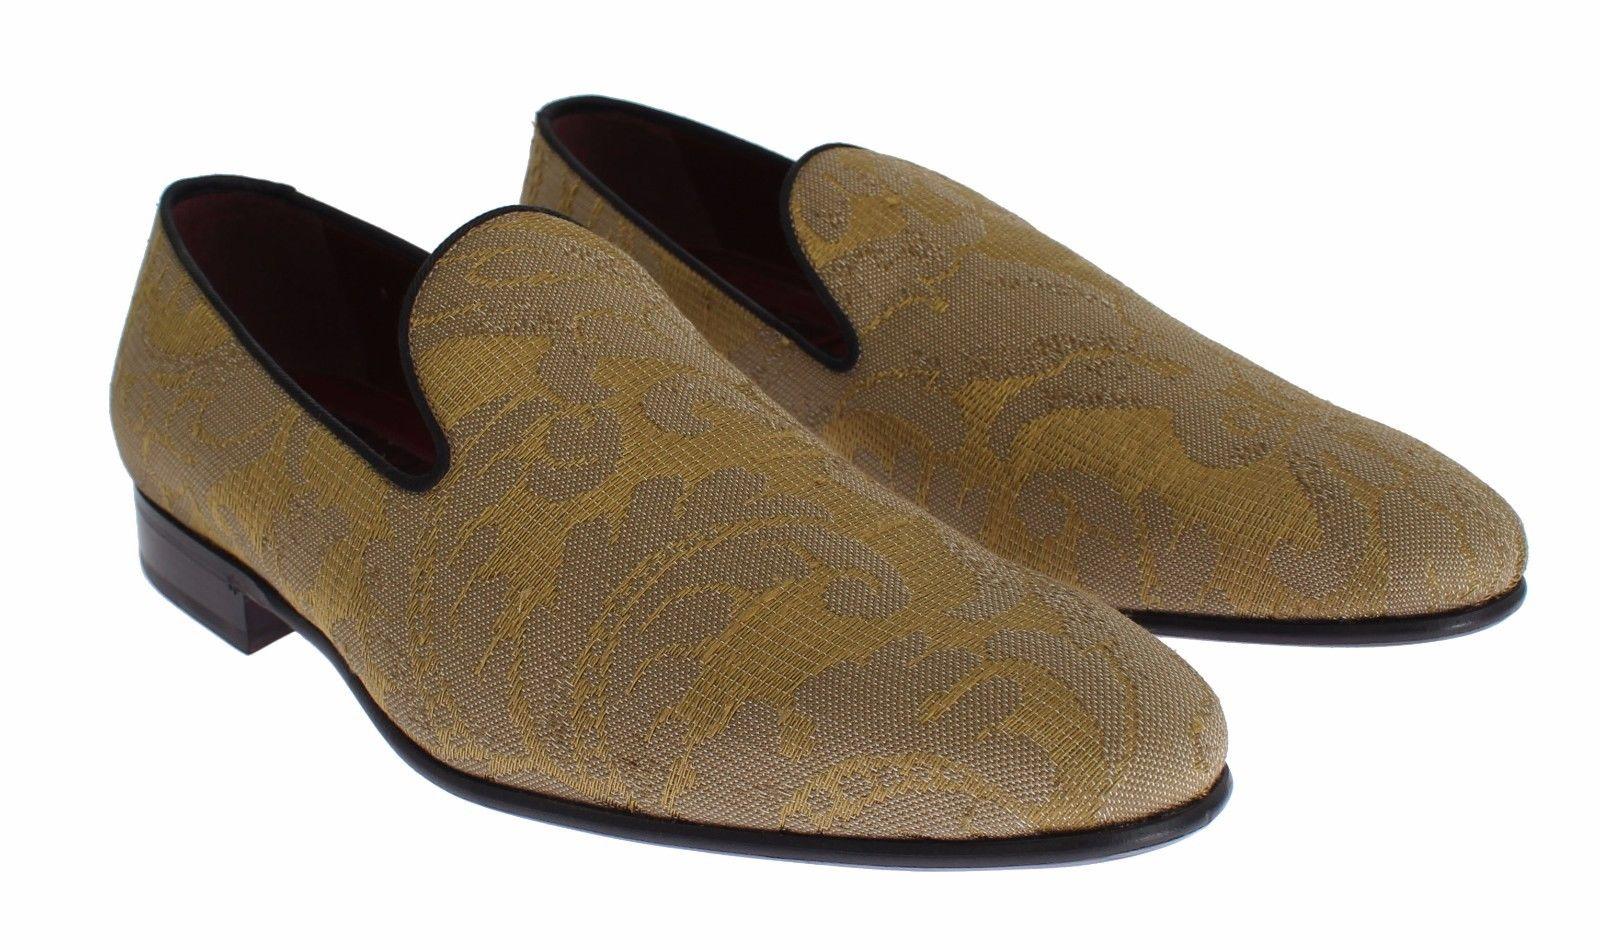 Dolce & Gabbana Men's Silk Baroque Loafers Shoes Gold SIG17169 - EU39/US6